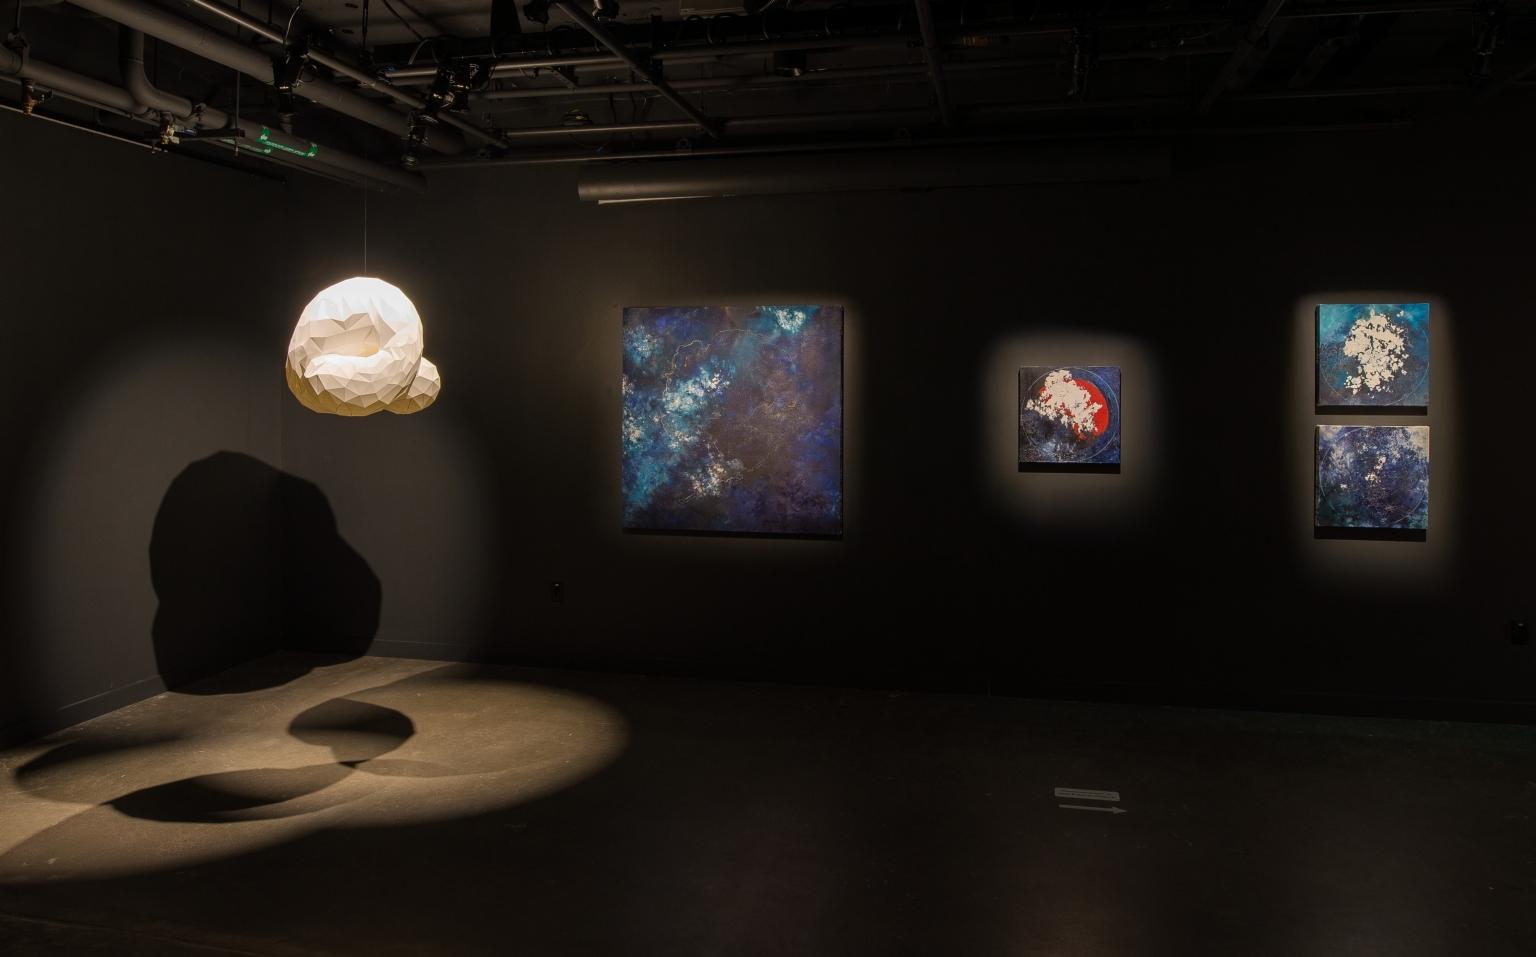 Project(ive) (Camila Friedman-Gerlicz); Glacier Map 3; Sphere 1; Sphere 2; Sphere 3 (Diane Burko)